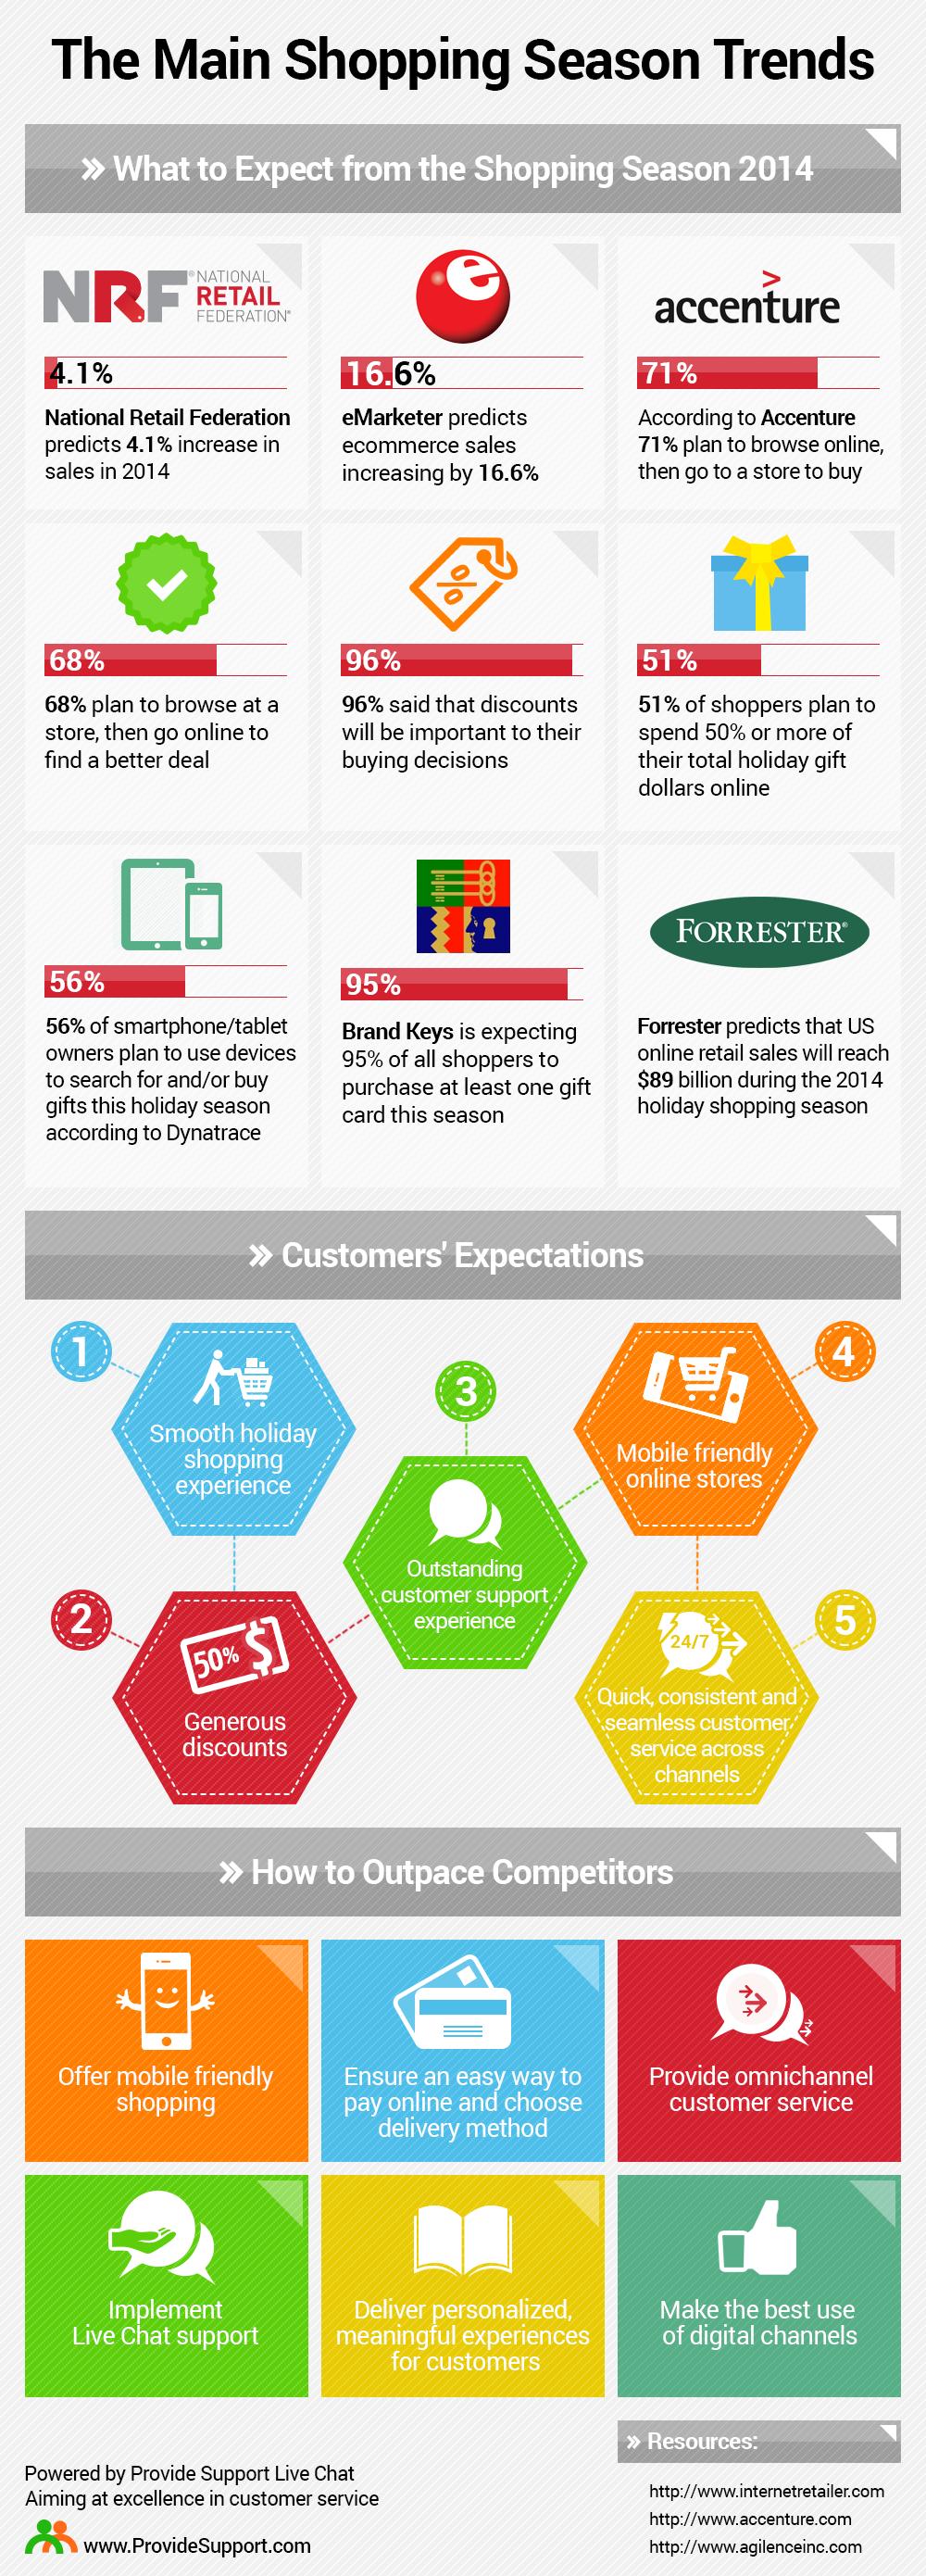 The Main Shopping Season Trends